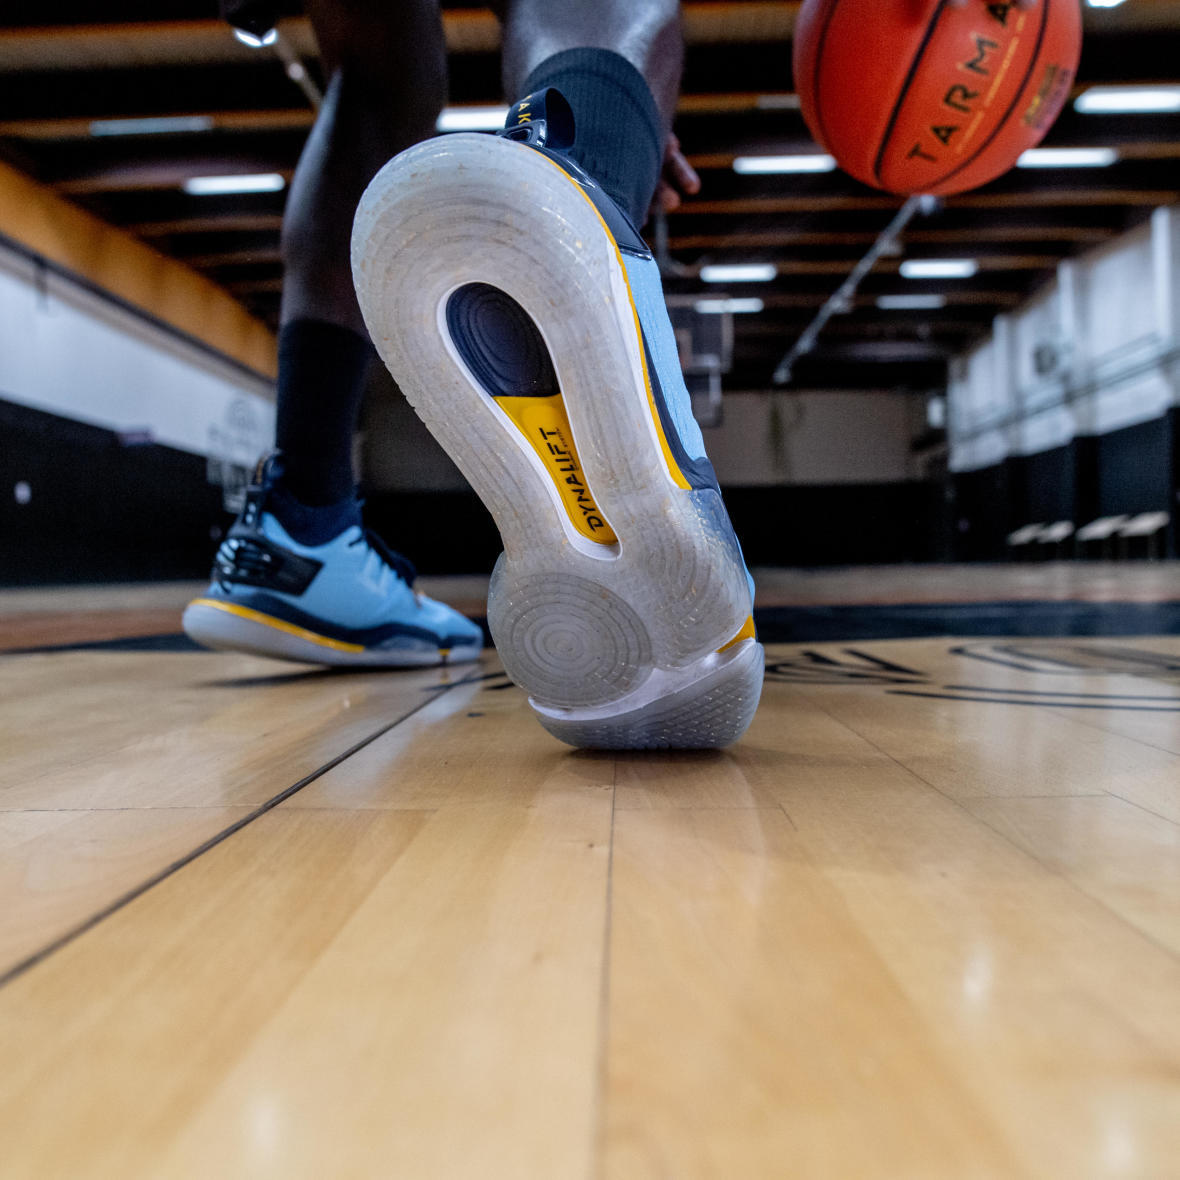 cc-choisir-expert-chaussure-basketball.jpg